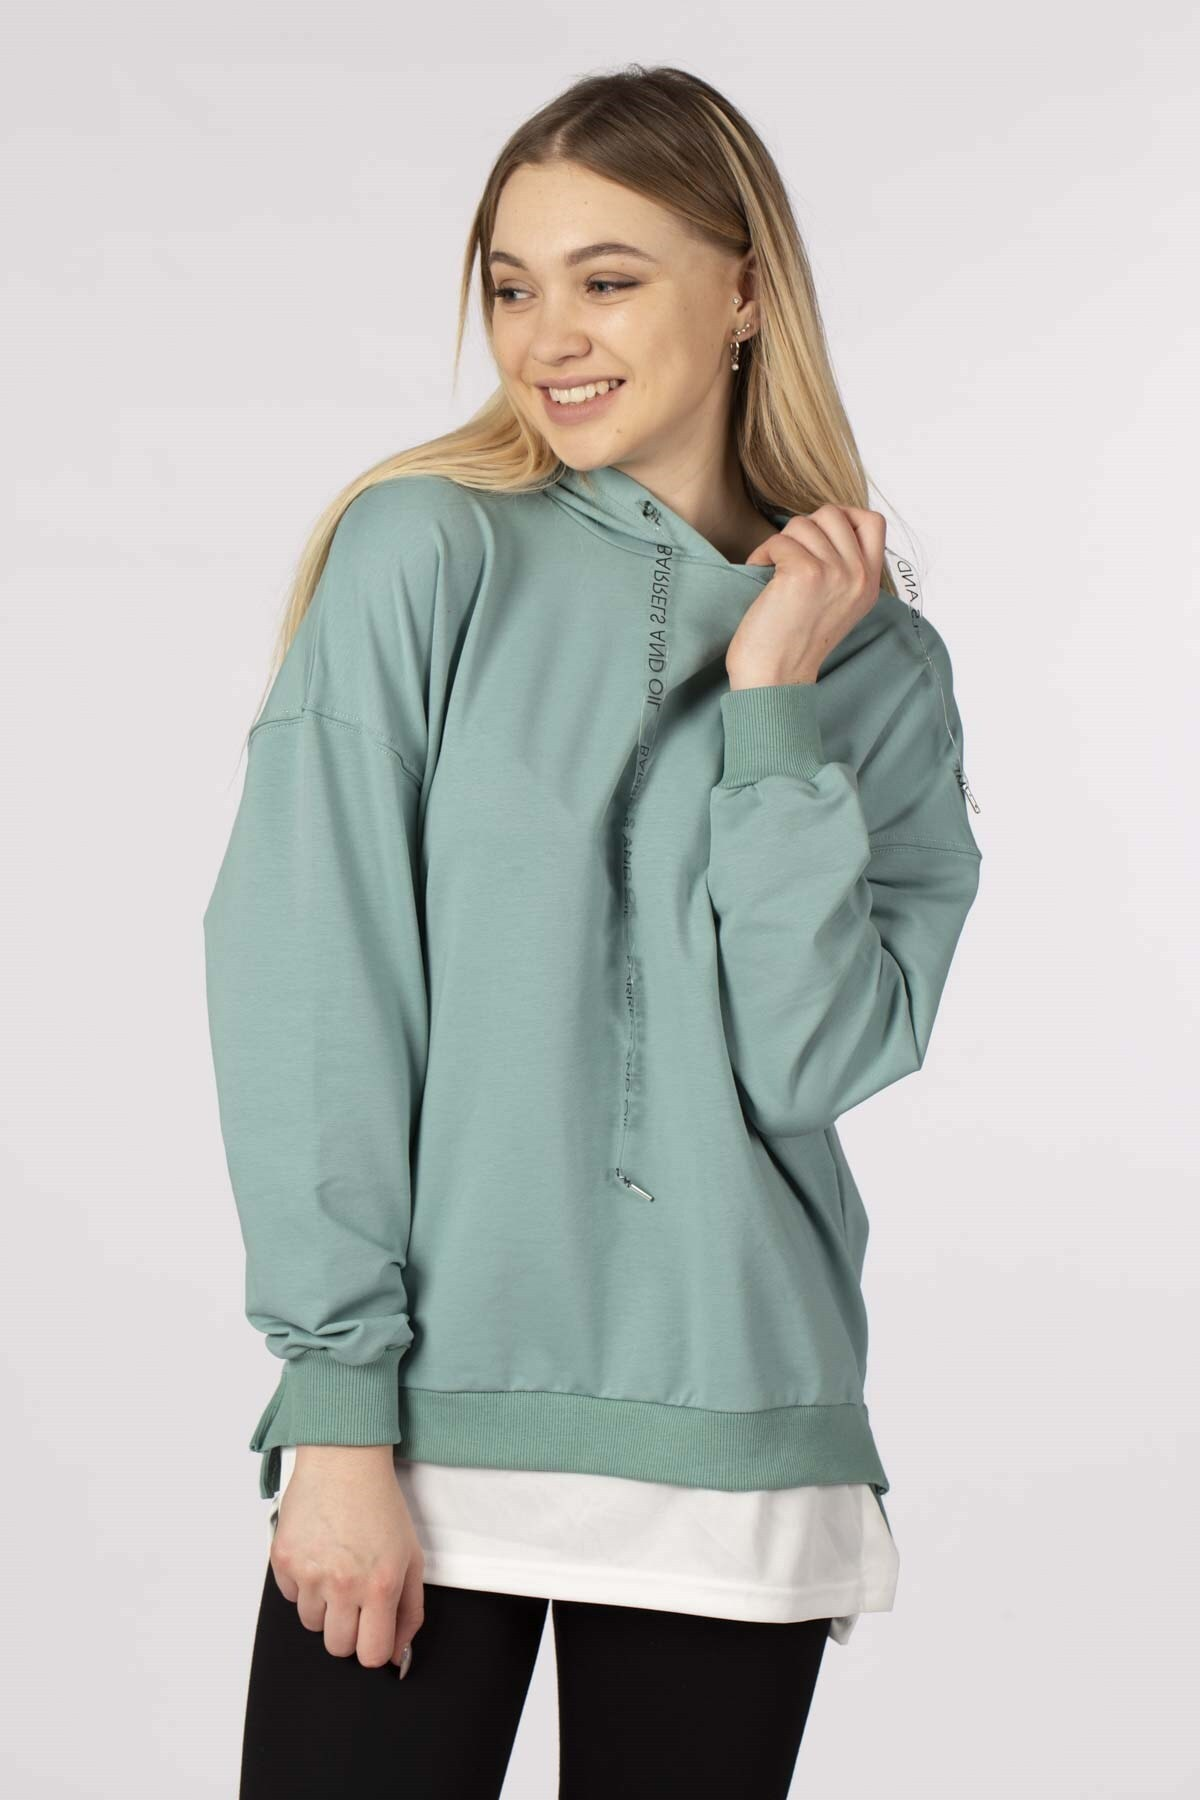 BARRELS AND OIL Kadın Mint Eteği Penyeli Kapüşonlu Sweatshirt 843-19K016.77